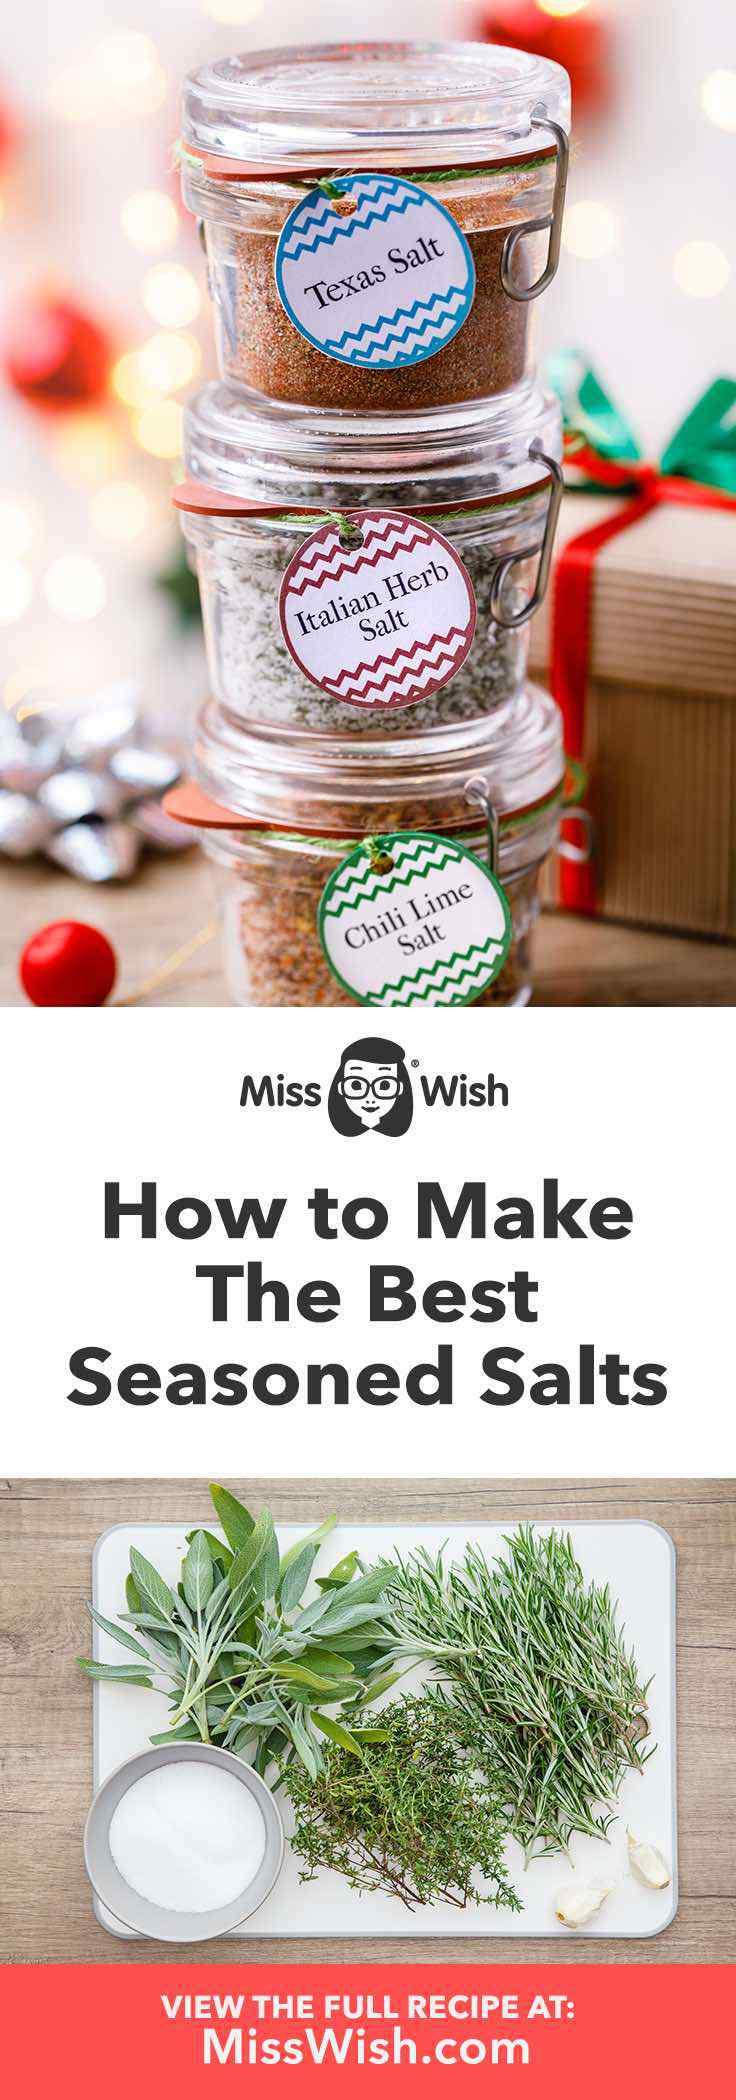 3 Best Homemade Seasoned Salts- chili lime, italian herb and texas salt.